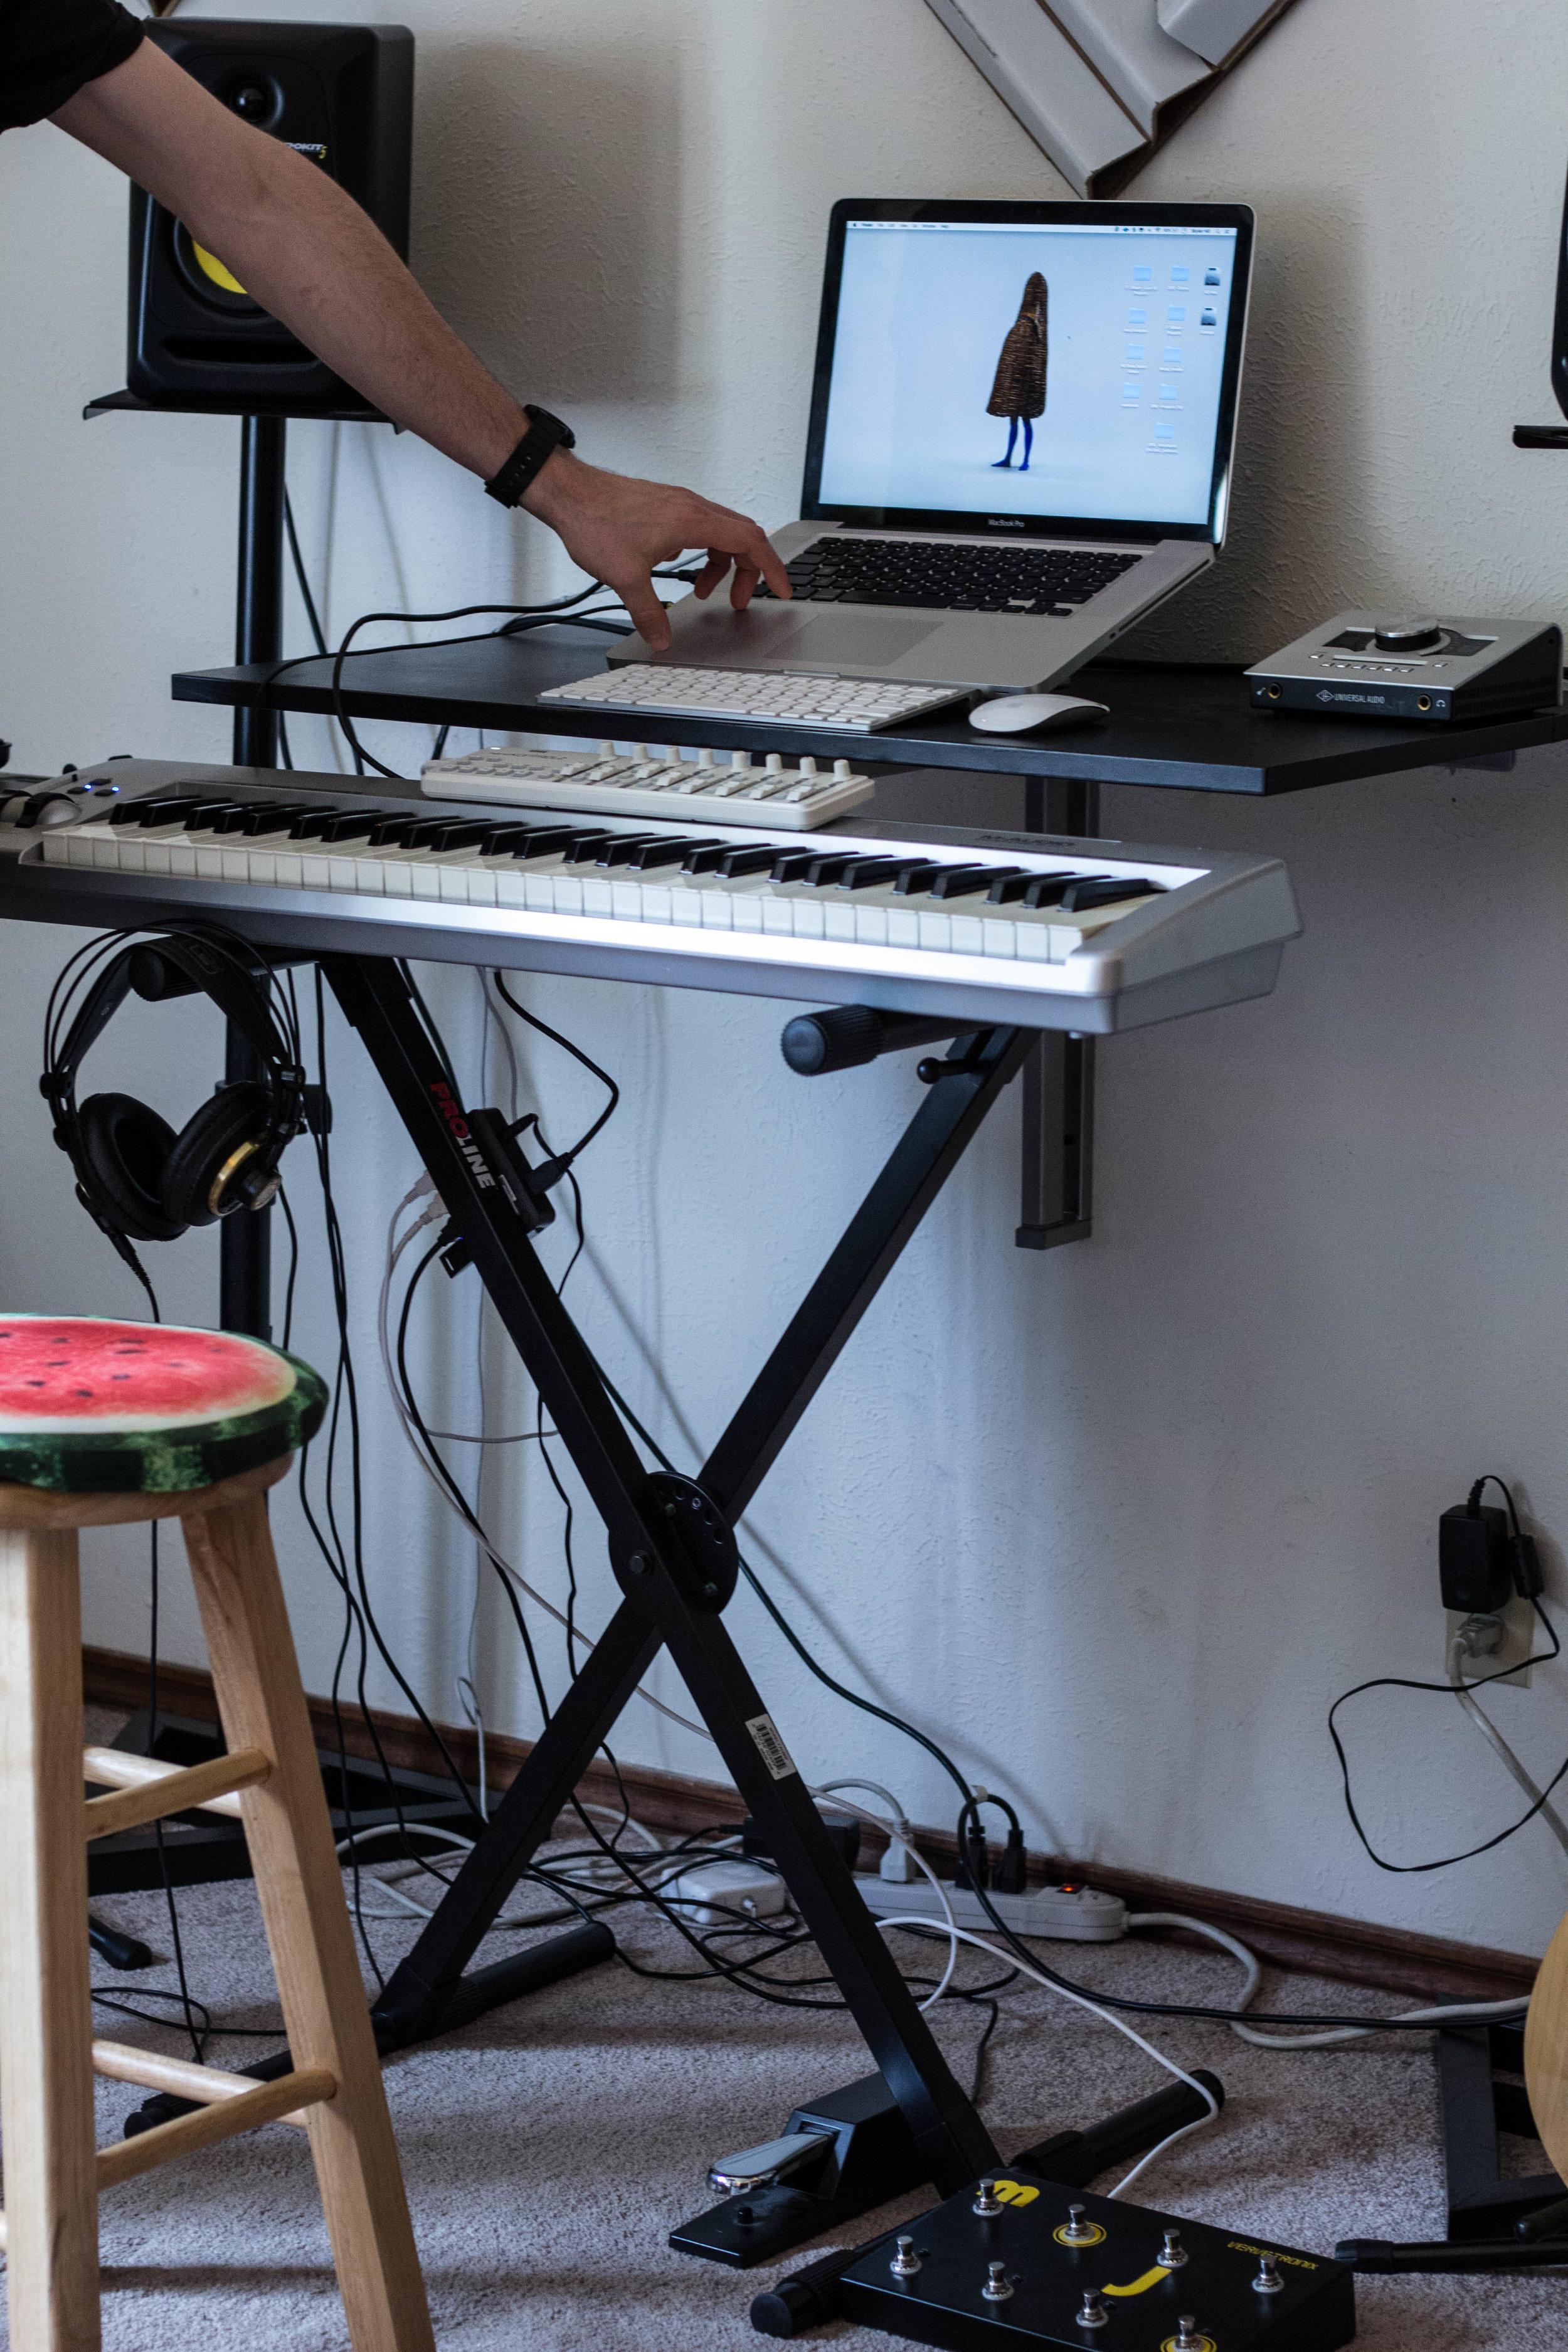 LAPTOP - 2009 MacBook Pro  KEYBOARD -  MAudio Keystation 61 key   AUDIO INTERFACE -  Apollo Twin Sound Station   MIDI CONTROLLER -  Korg NanoKontrol2